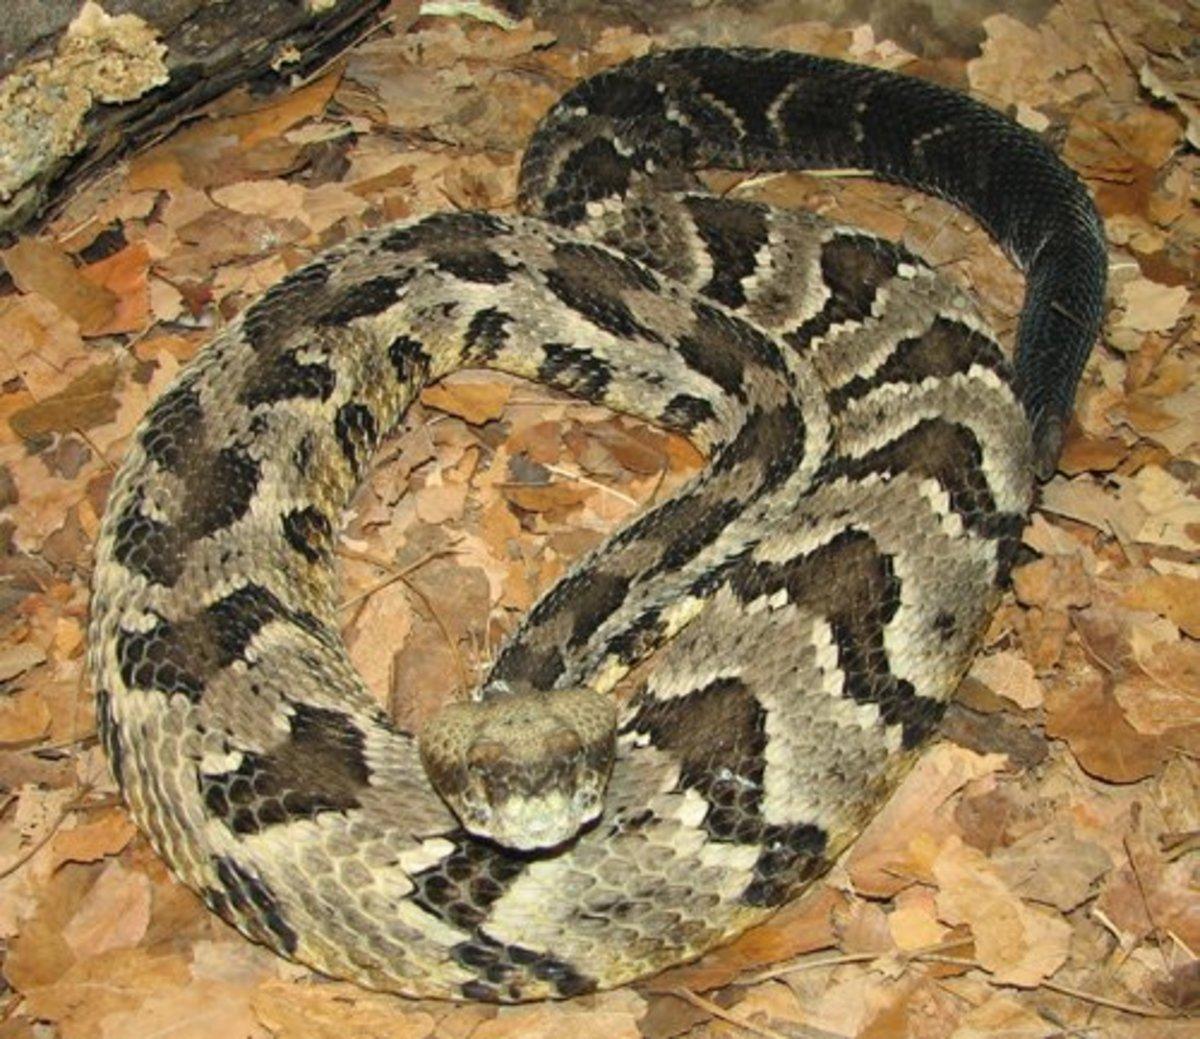 Timber Rattlesnake. Photo by by Trisha M. Shears. Public domain.